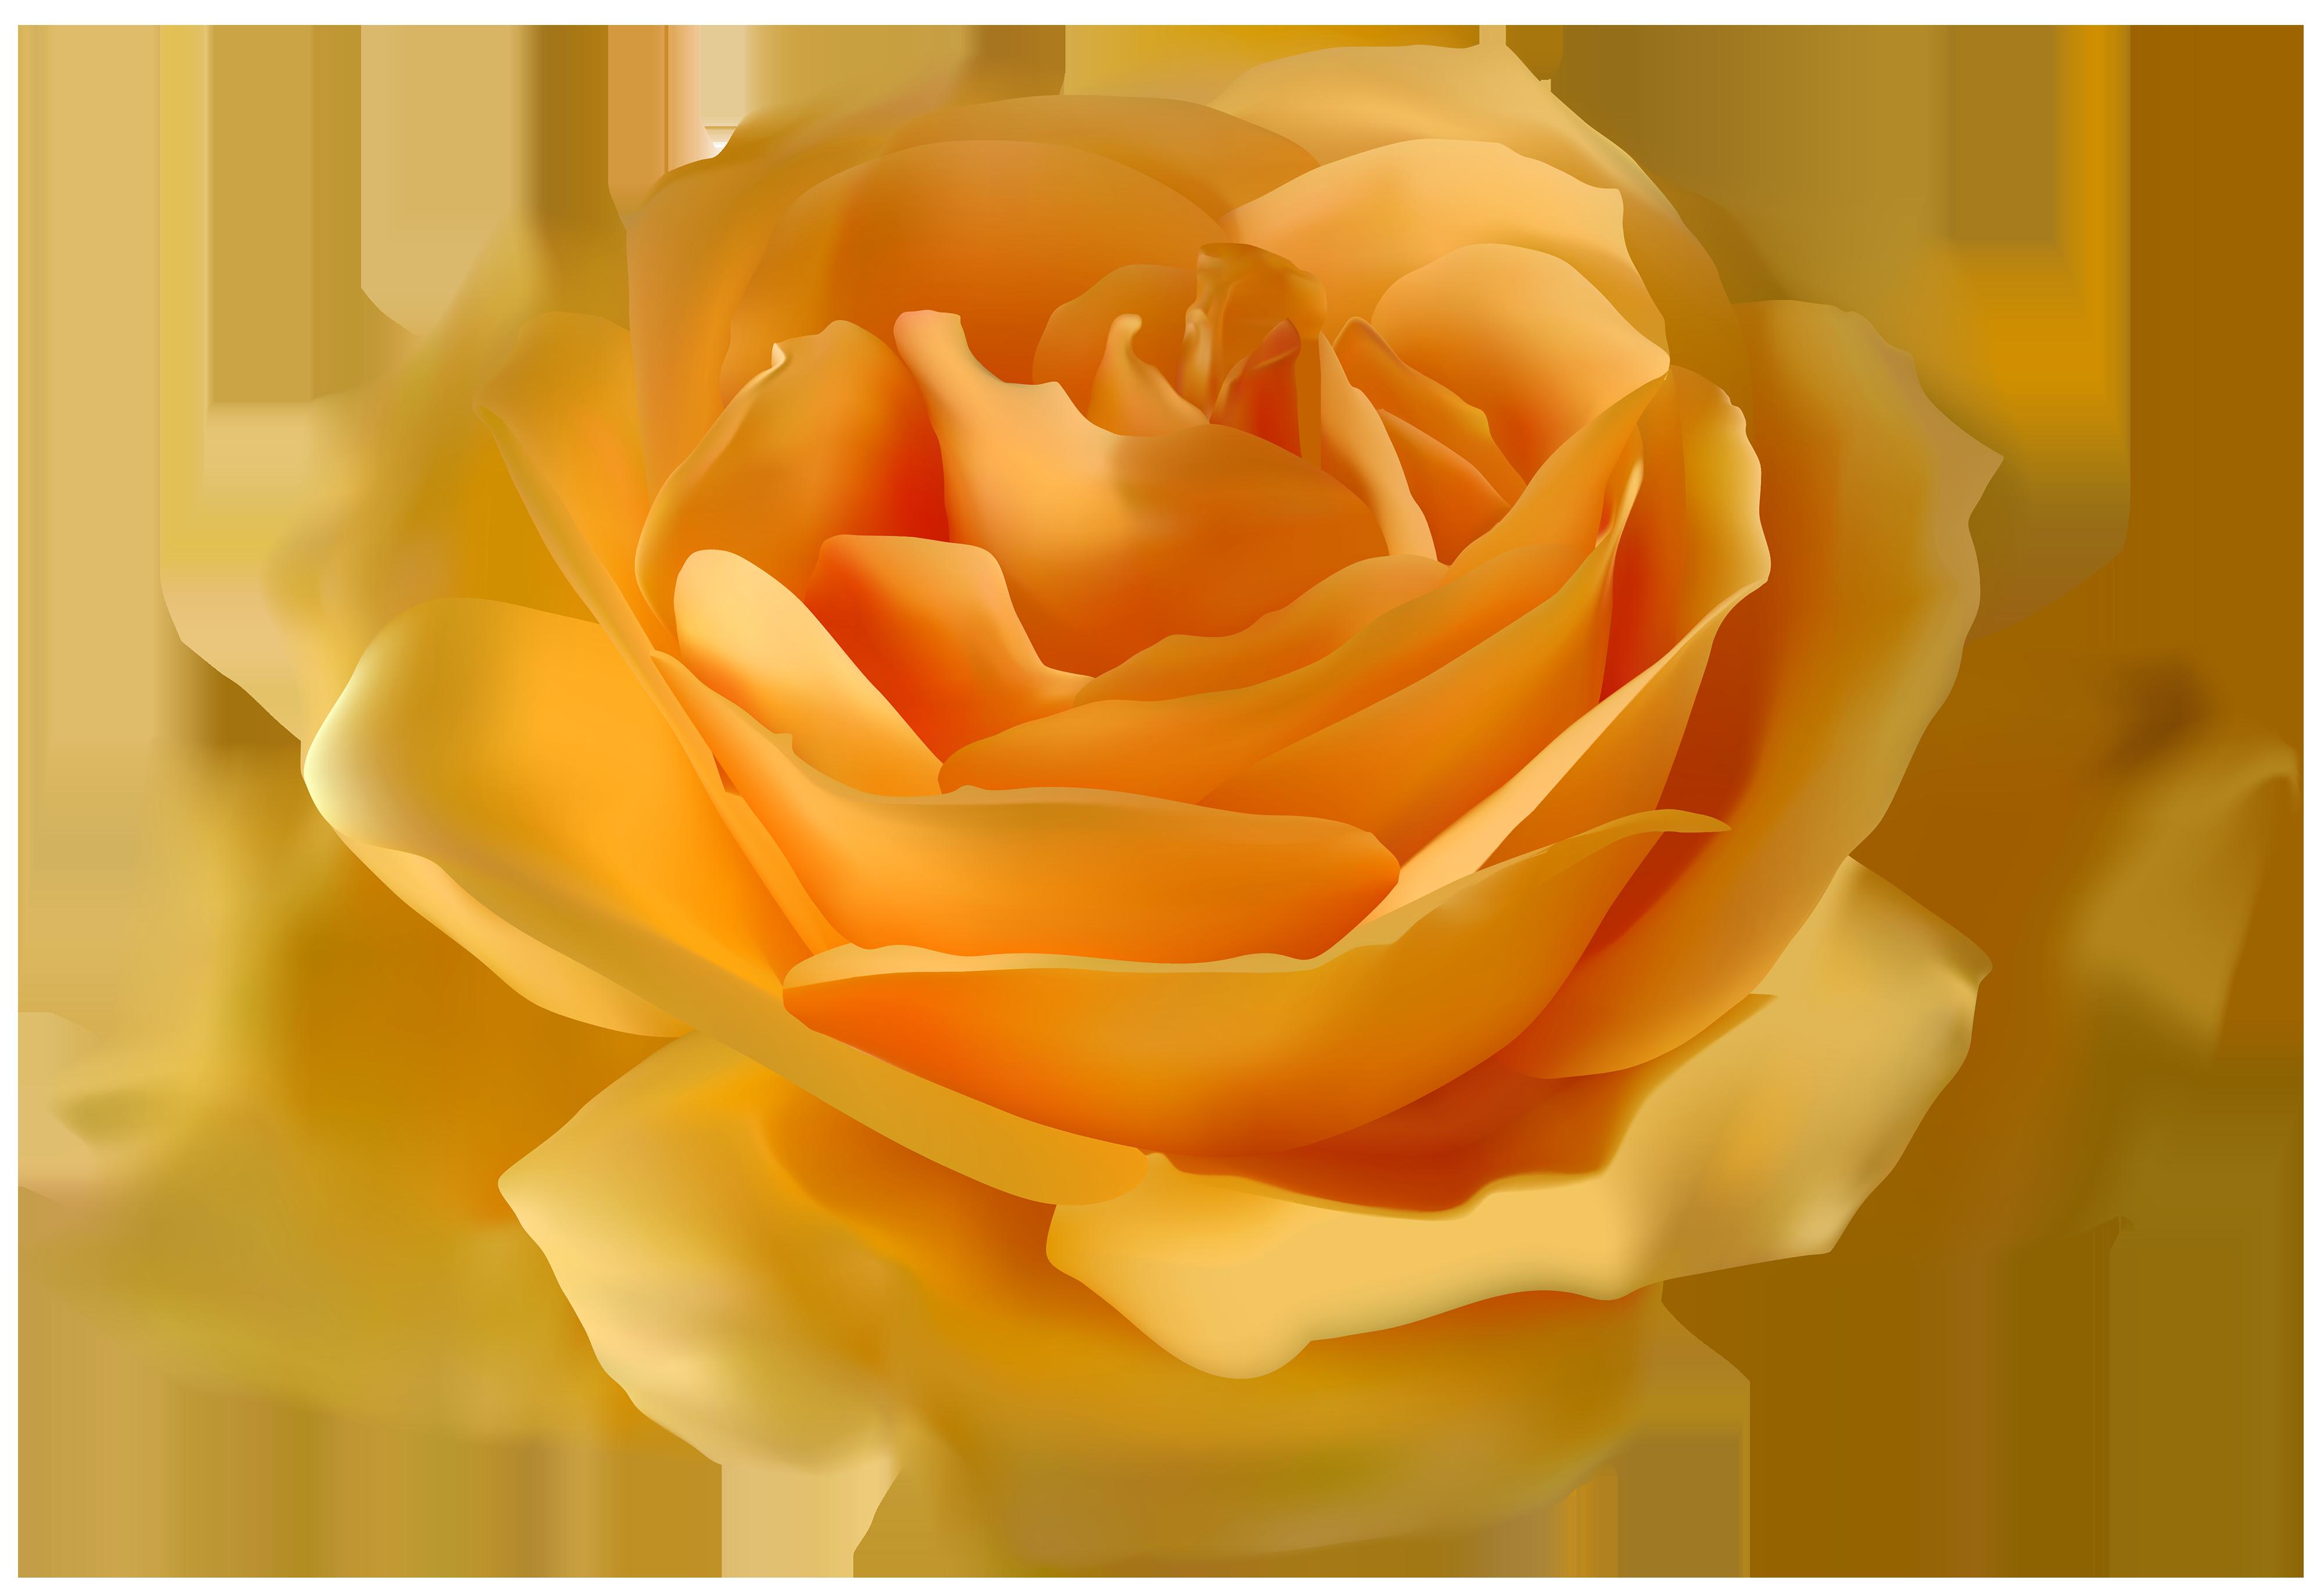 Yellow rose clipart png clip art transparent library Yellow Rose PNG Clipart - Best WEB Clipart clip art transparent library